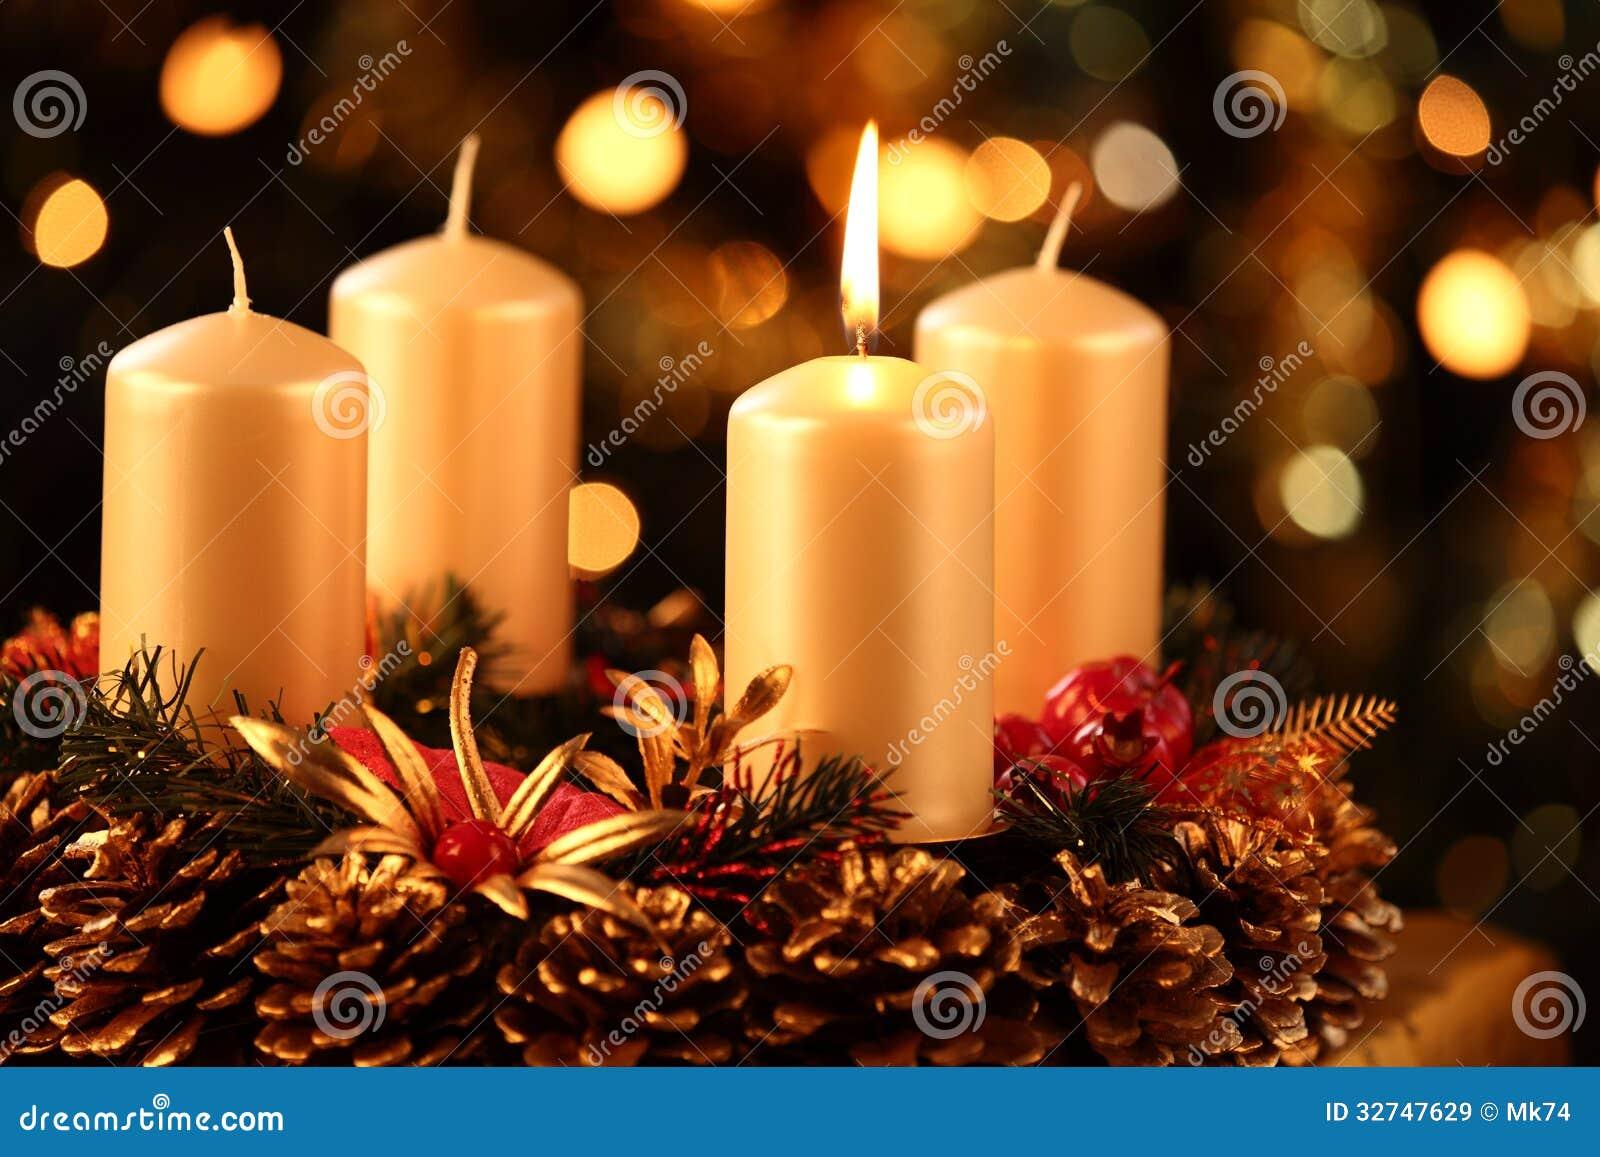 advent wreath stock image image of focus close holidays. Black Bedroom Furniture Sets. Home Design Ideas